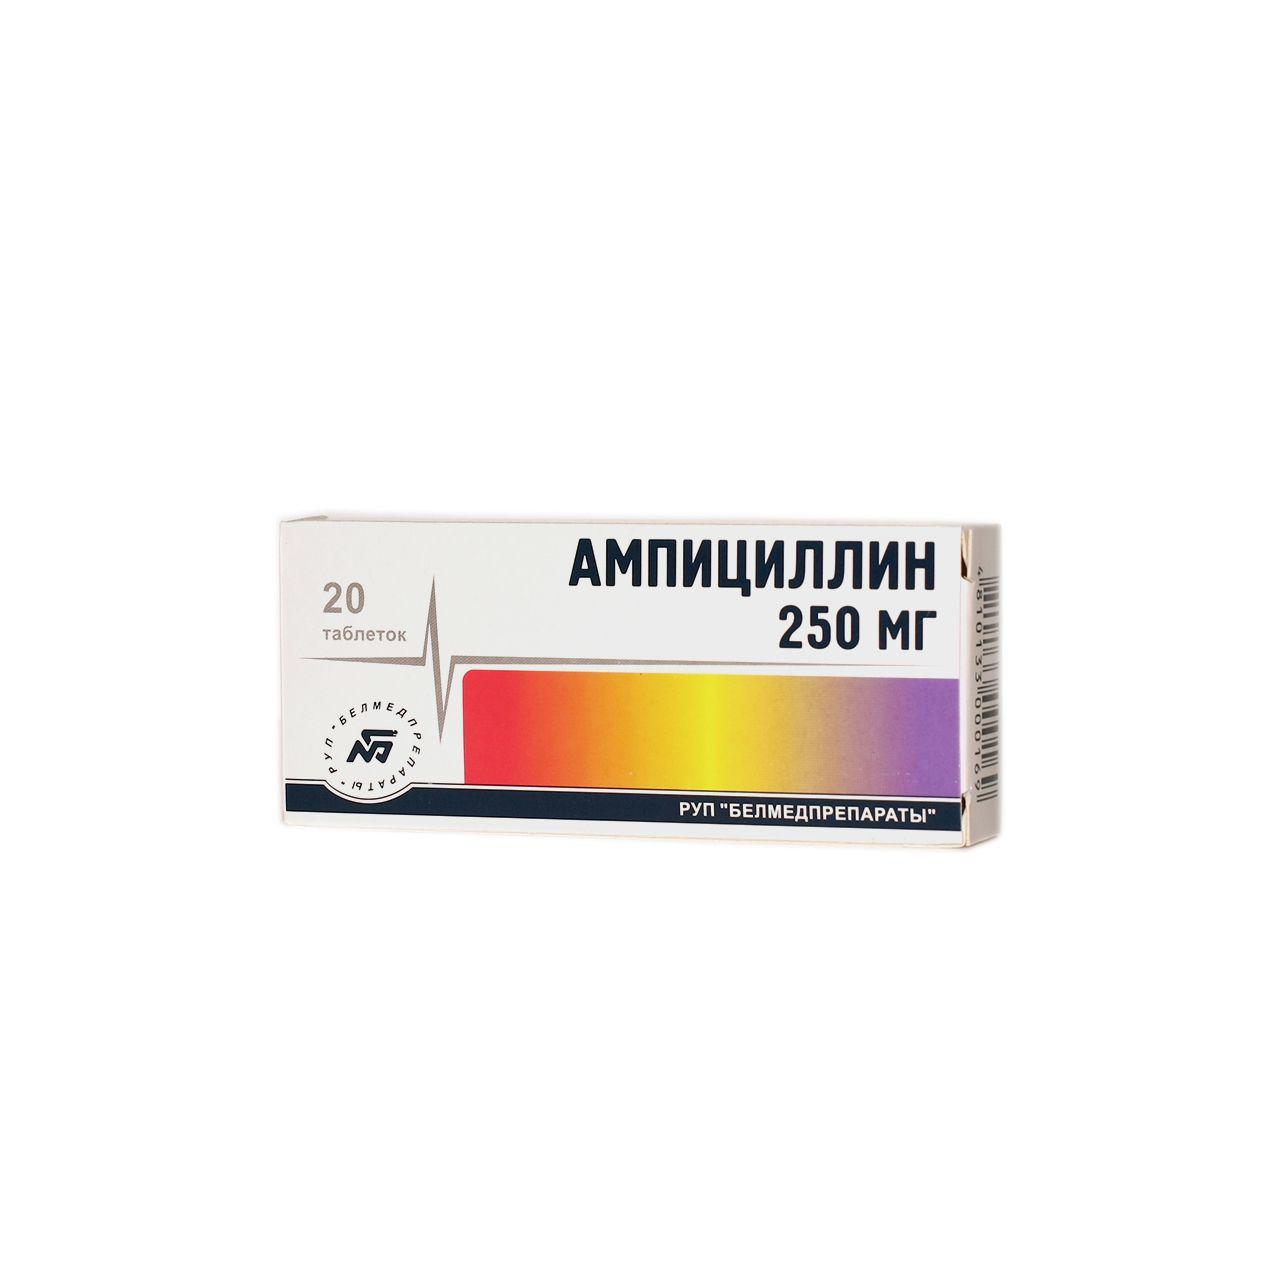 лекарство ампициллин от чего помогает